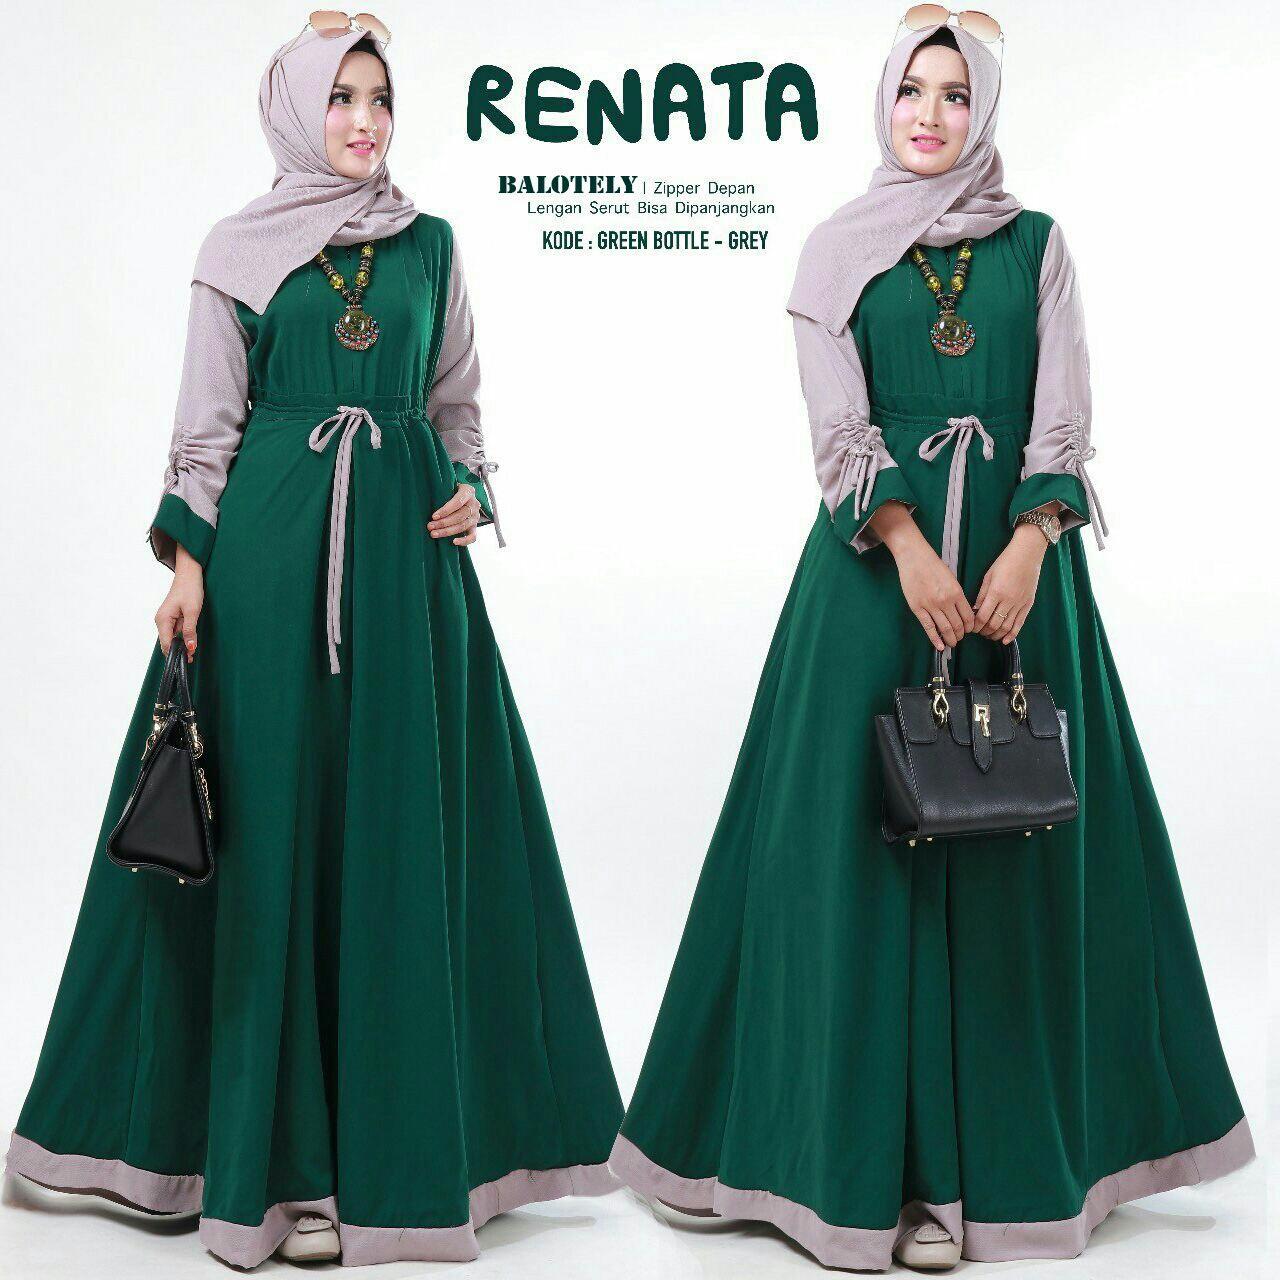 HoneyClothing Dress Muslim Renisa // Baju Muslim // Gamis Muslimah // Gamis Trendy